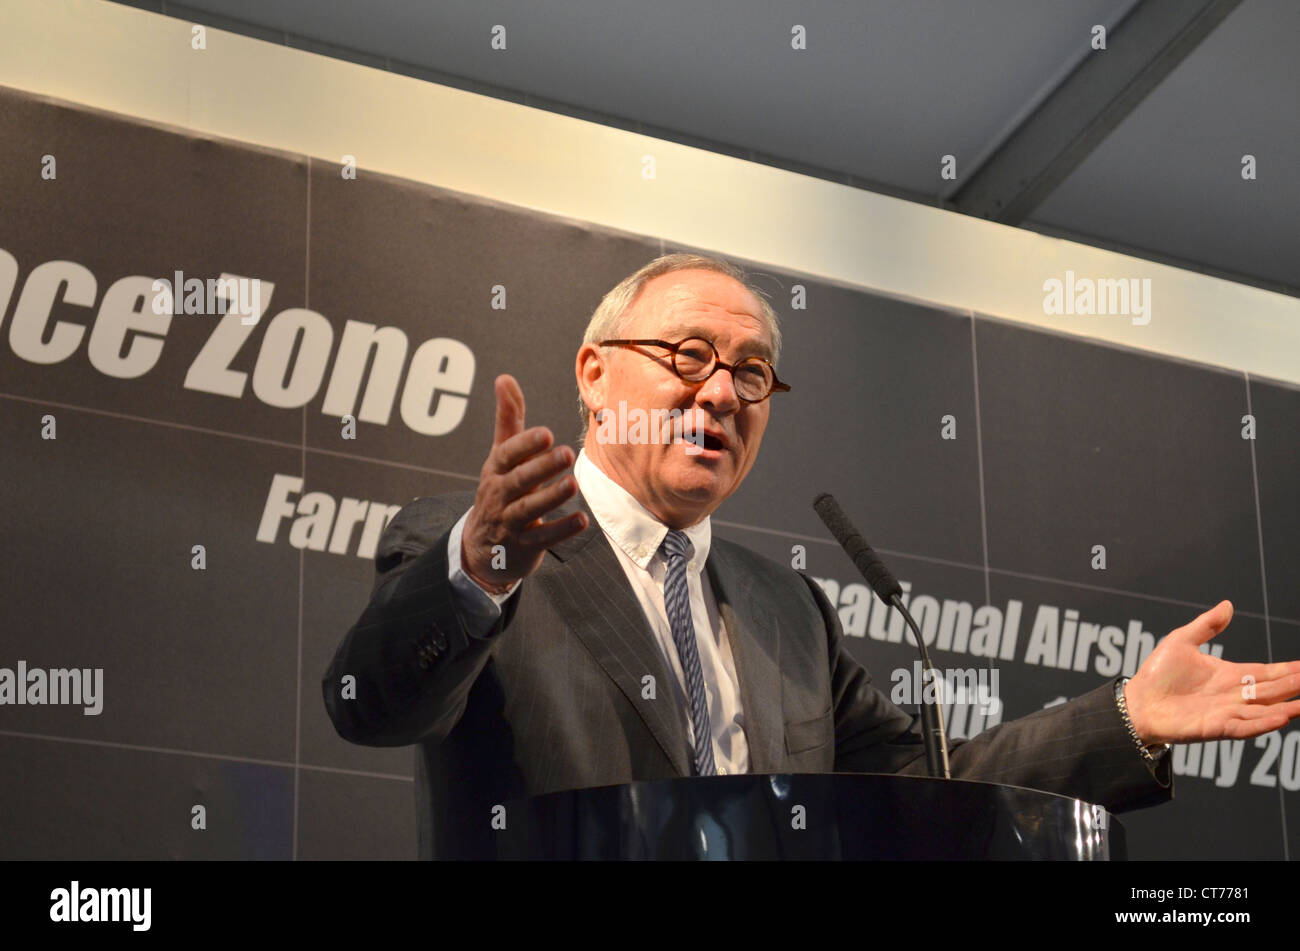 Jean Jacques Dordain, Director General ESA, speaking at the Farnborough Air Show - Stock Image